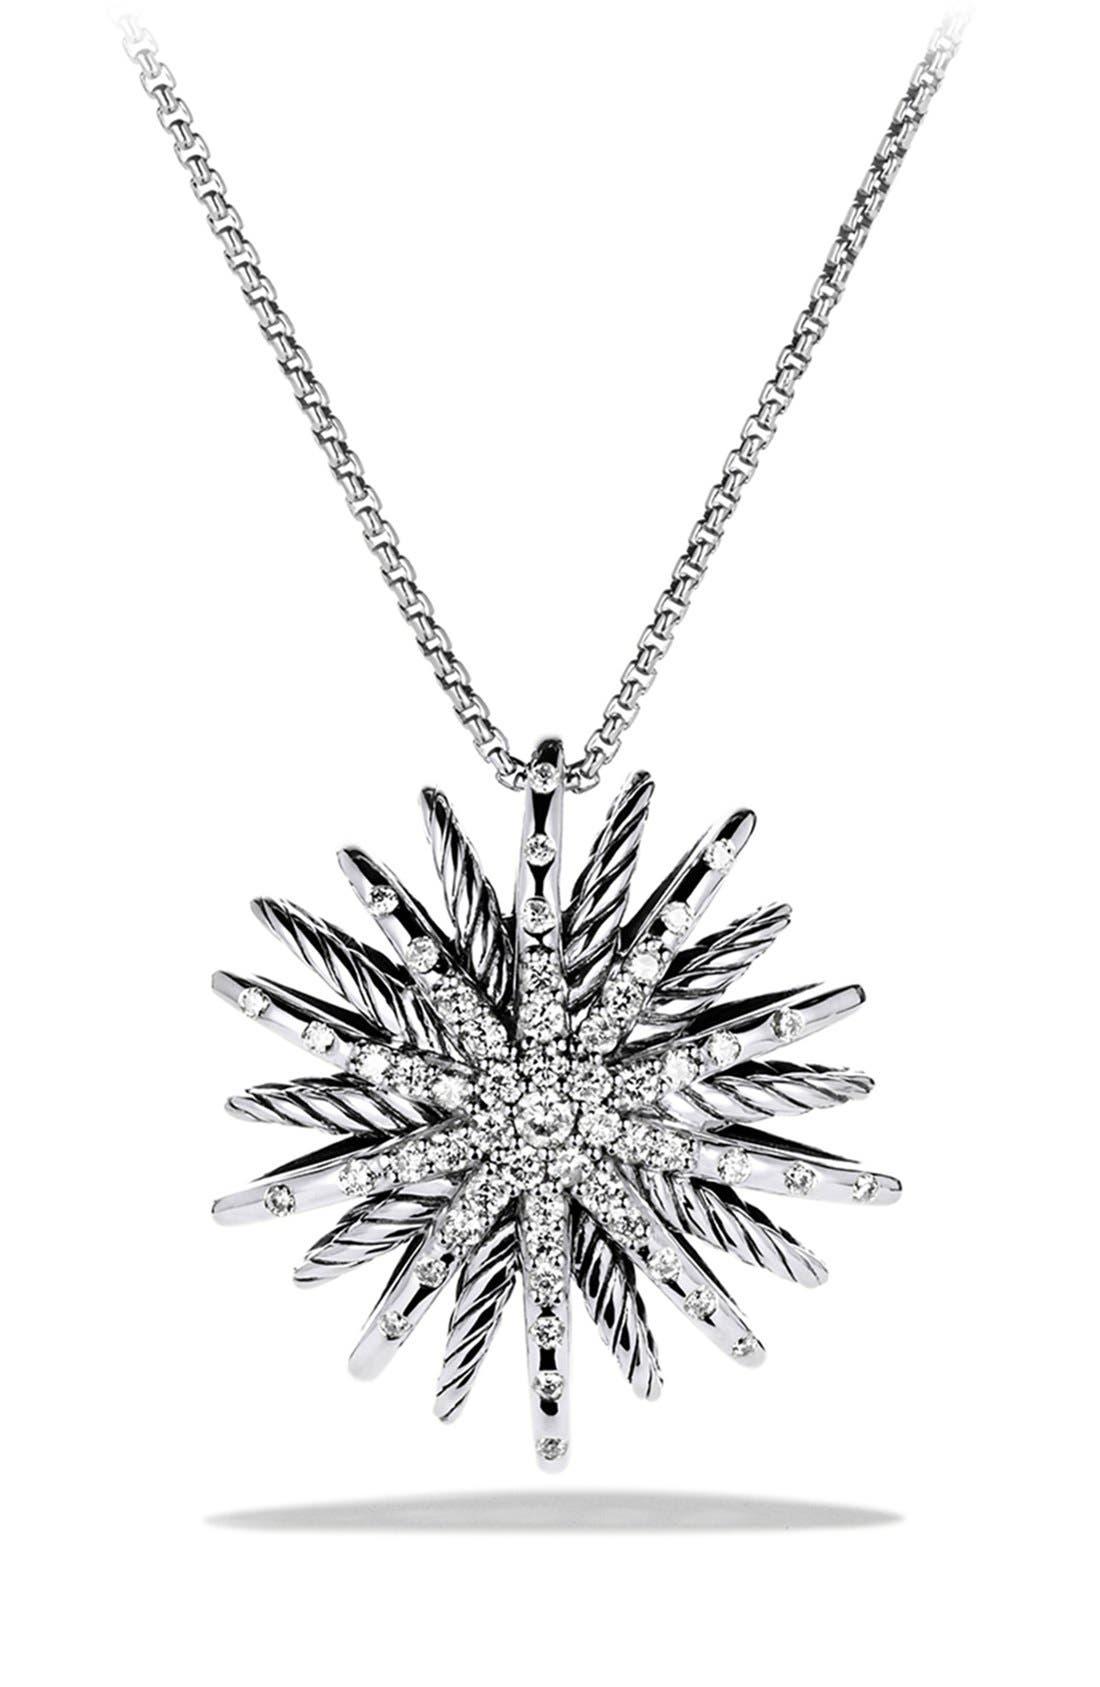 Main Image - David Yurman 'Starburst' Medium Pendant with Diamonds on Chain